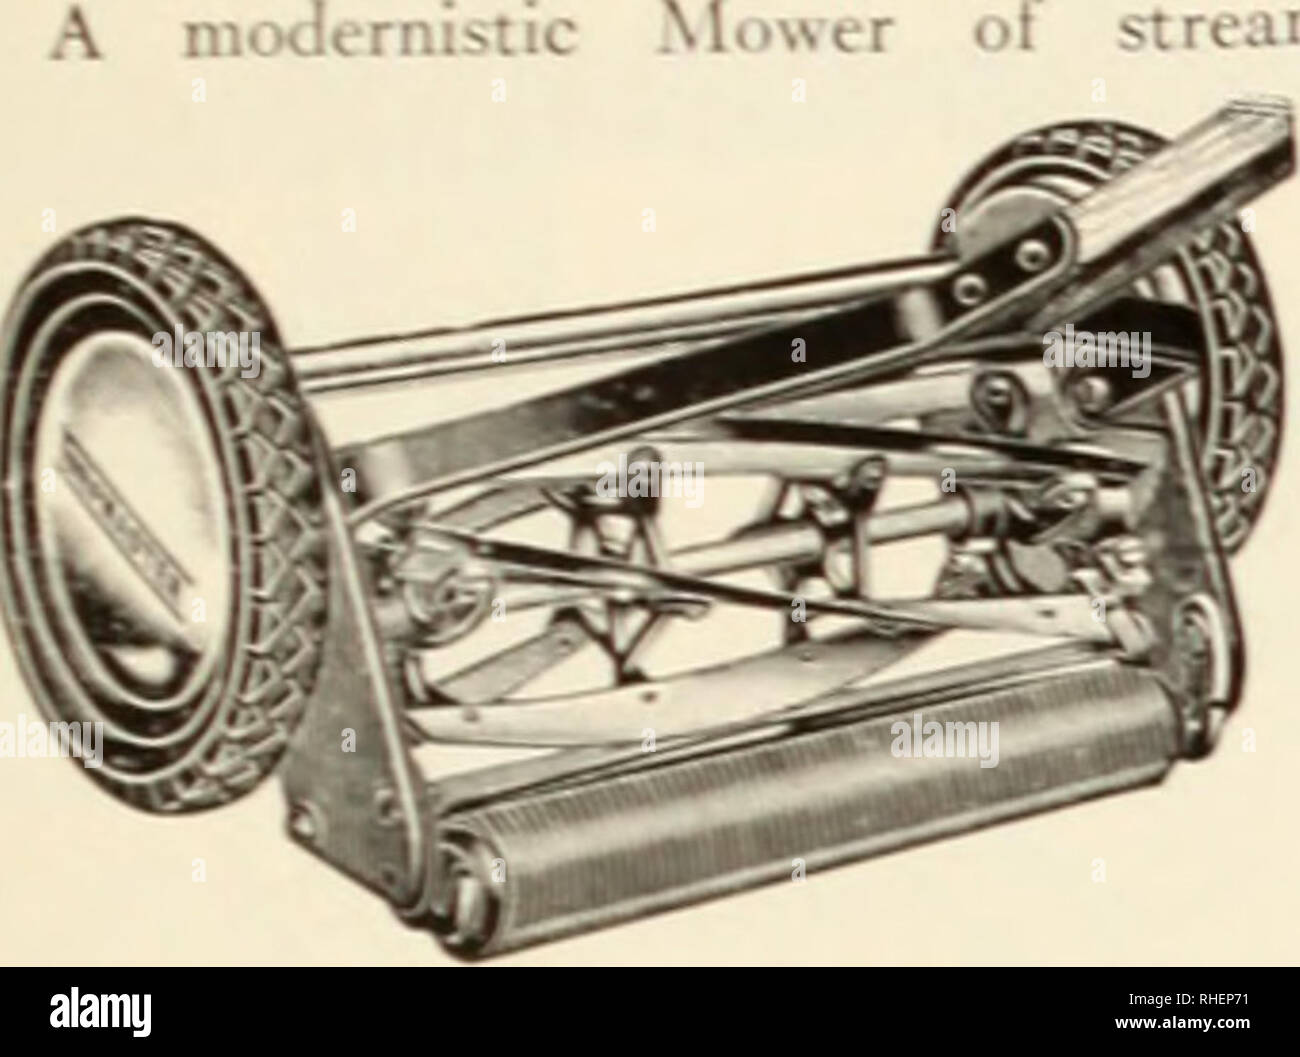 Reel Mowers Stock Photos & Reel Mowers Stock Images - Alamy